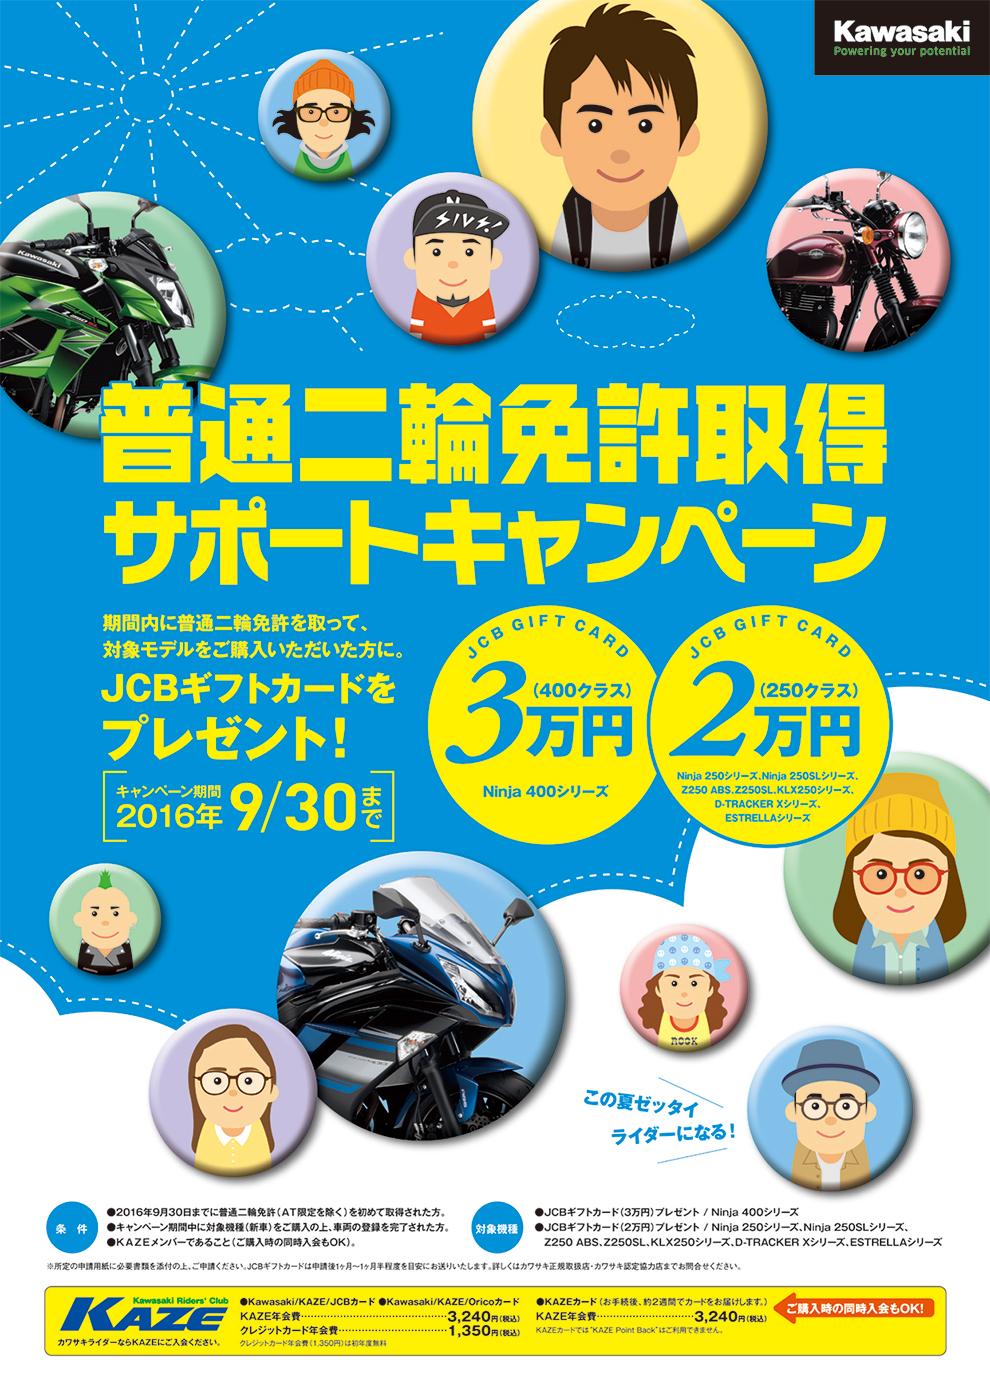 2016-campaign_004.jpg 普通二輪免許取得サポートキャンペーン